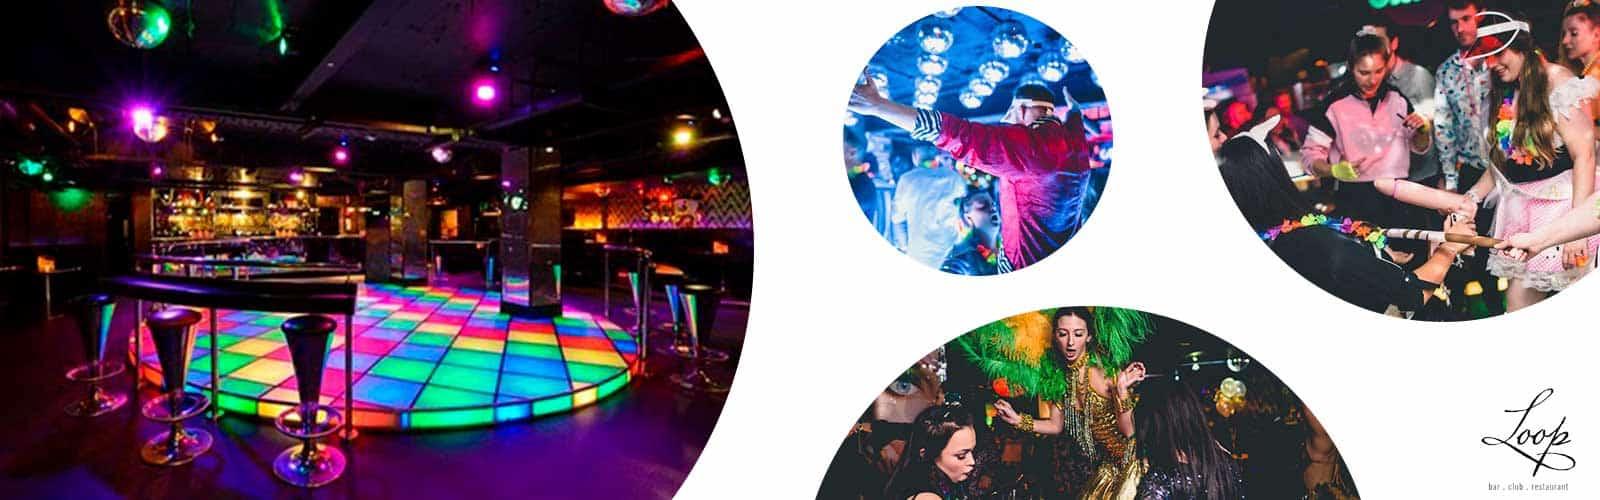 Loop Bar Club Londres